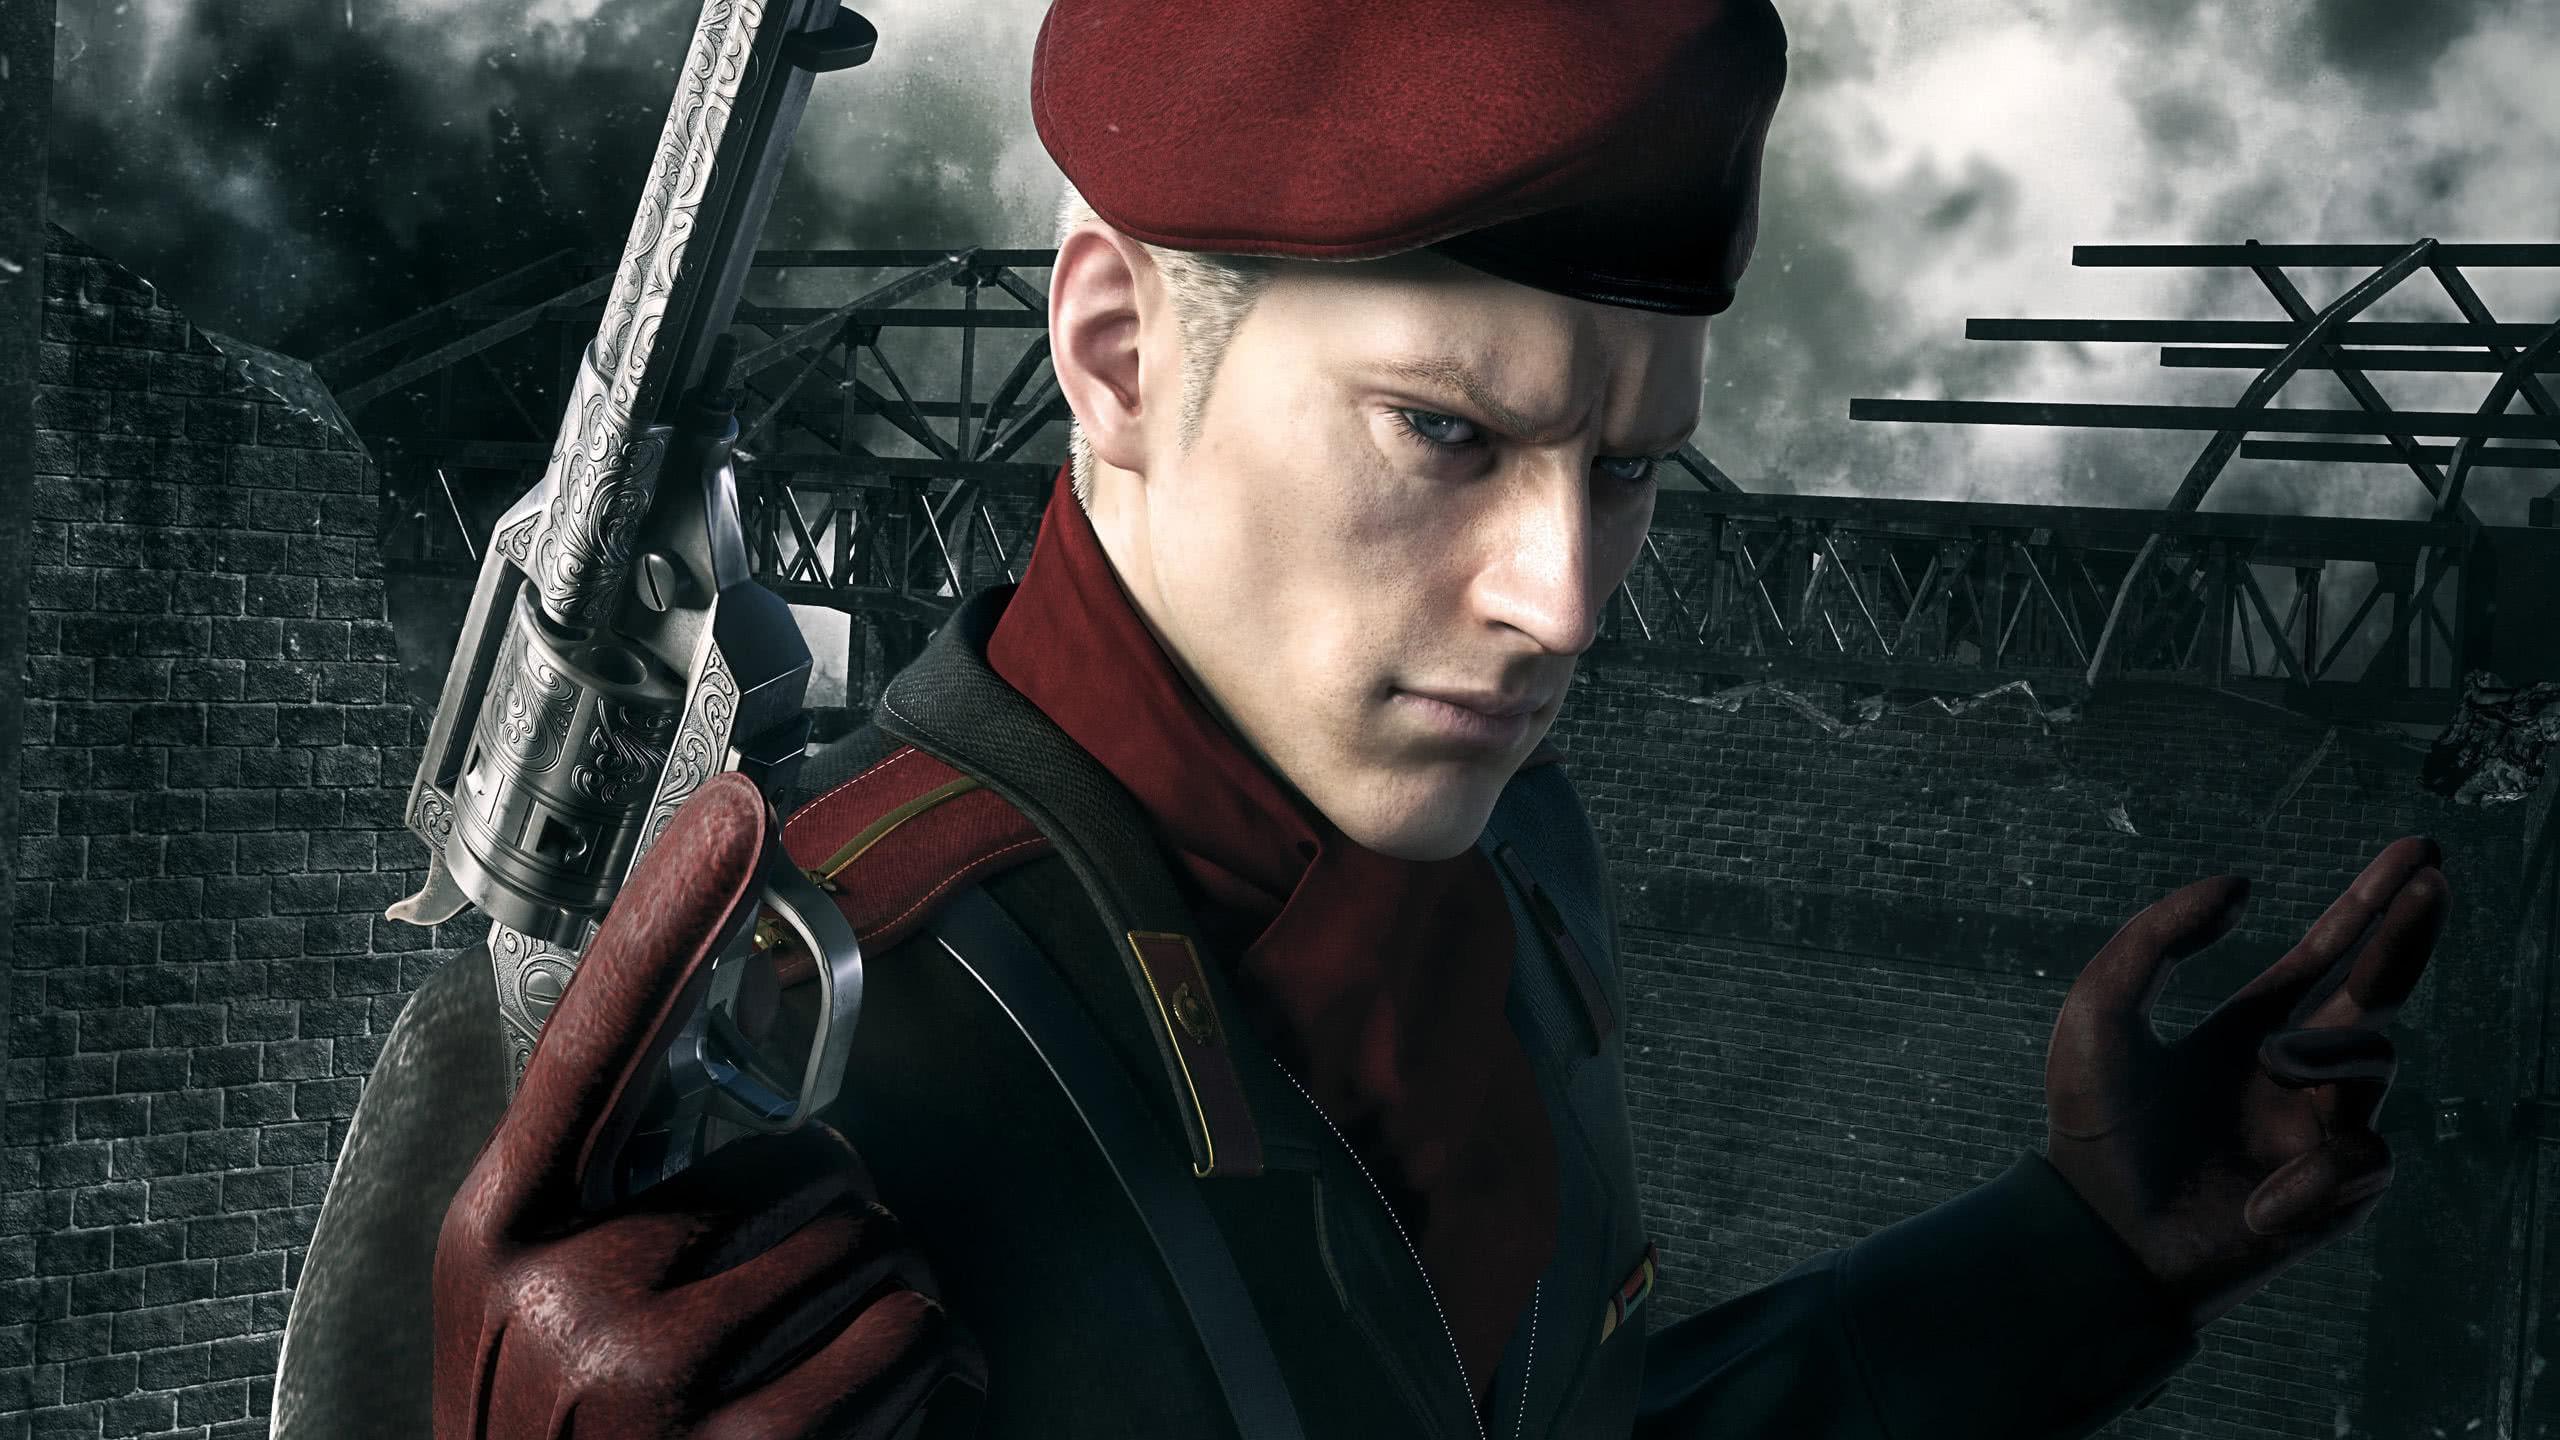 Metal Gear Solid 3 Snake Eater Revolver Ocelot Wqhd 1440p